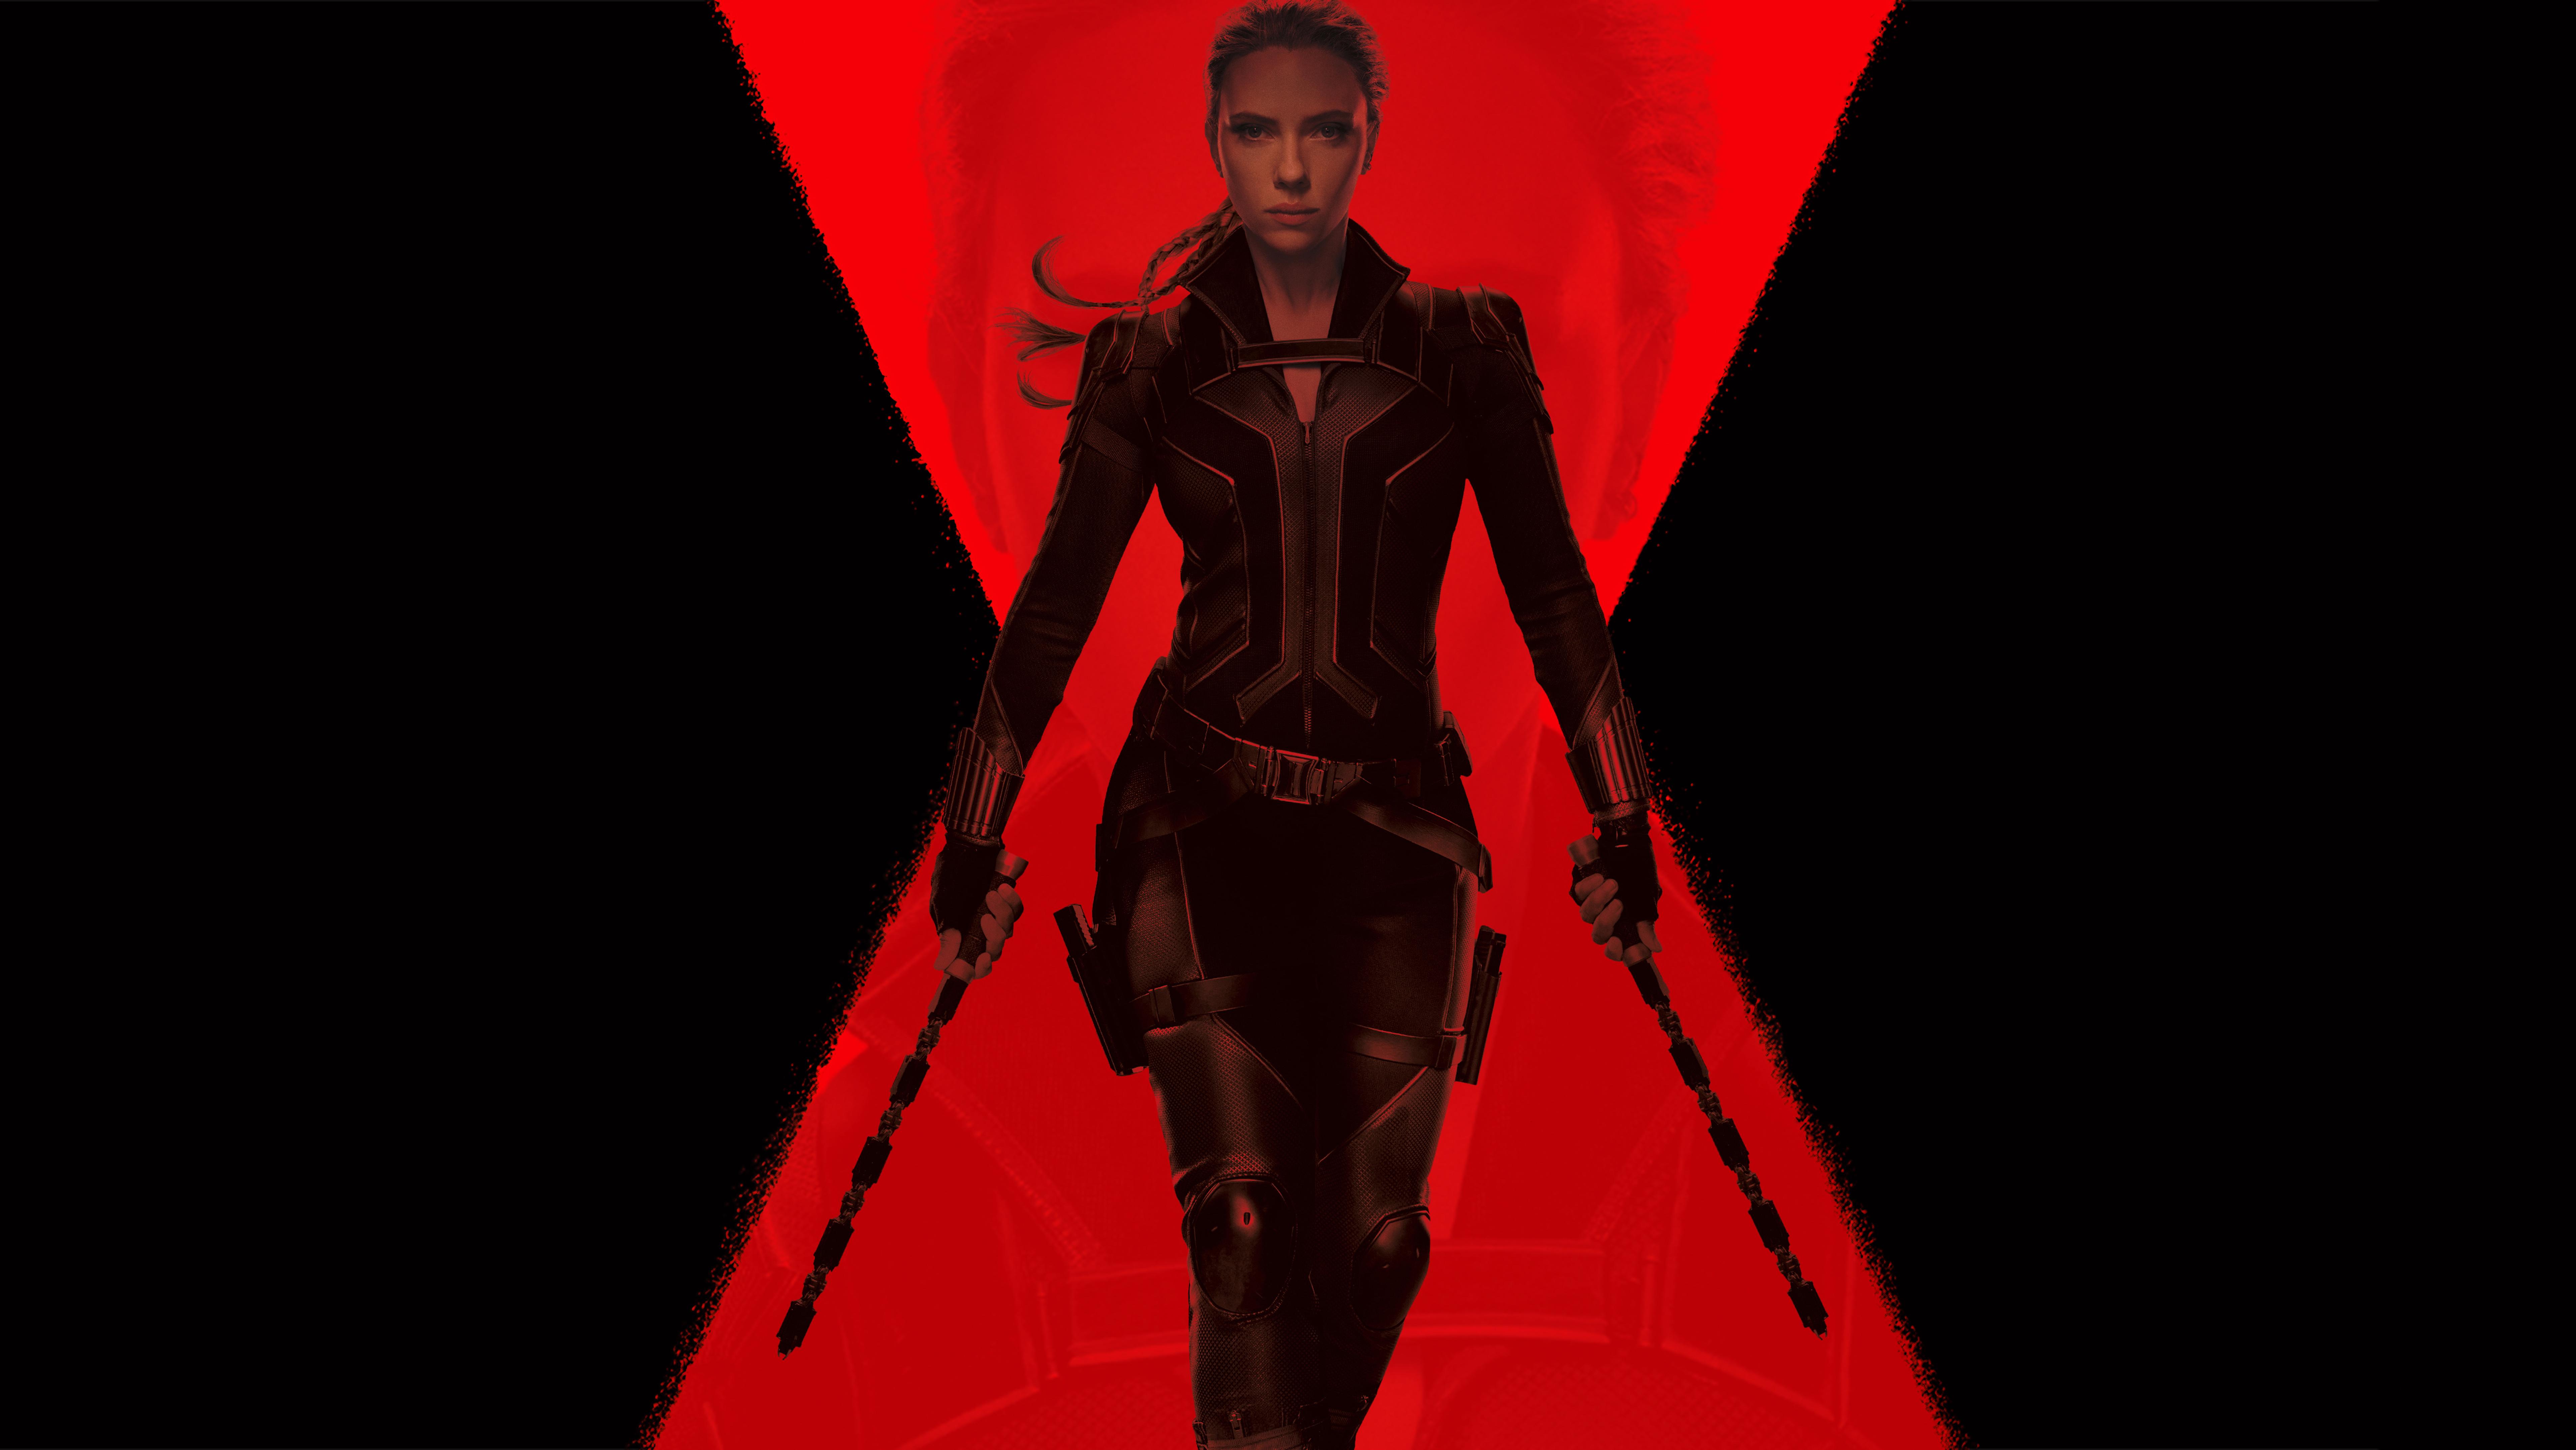 Black Widow 4k Wallpaper Scarlett Johansson Dc Comics 2020 Movies 5k 8k Movies 541